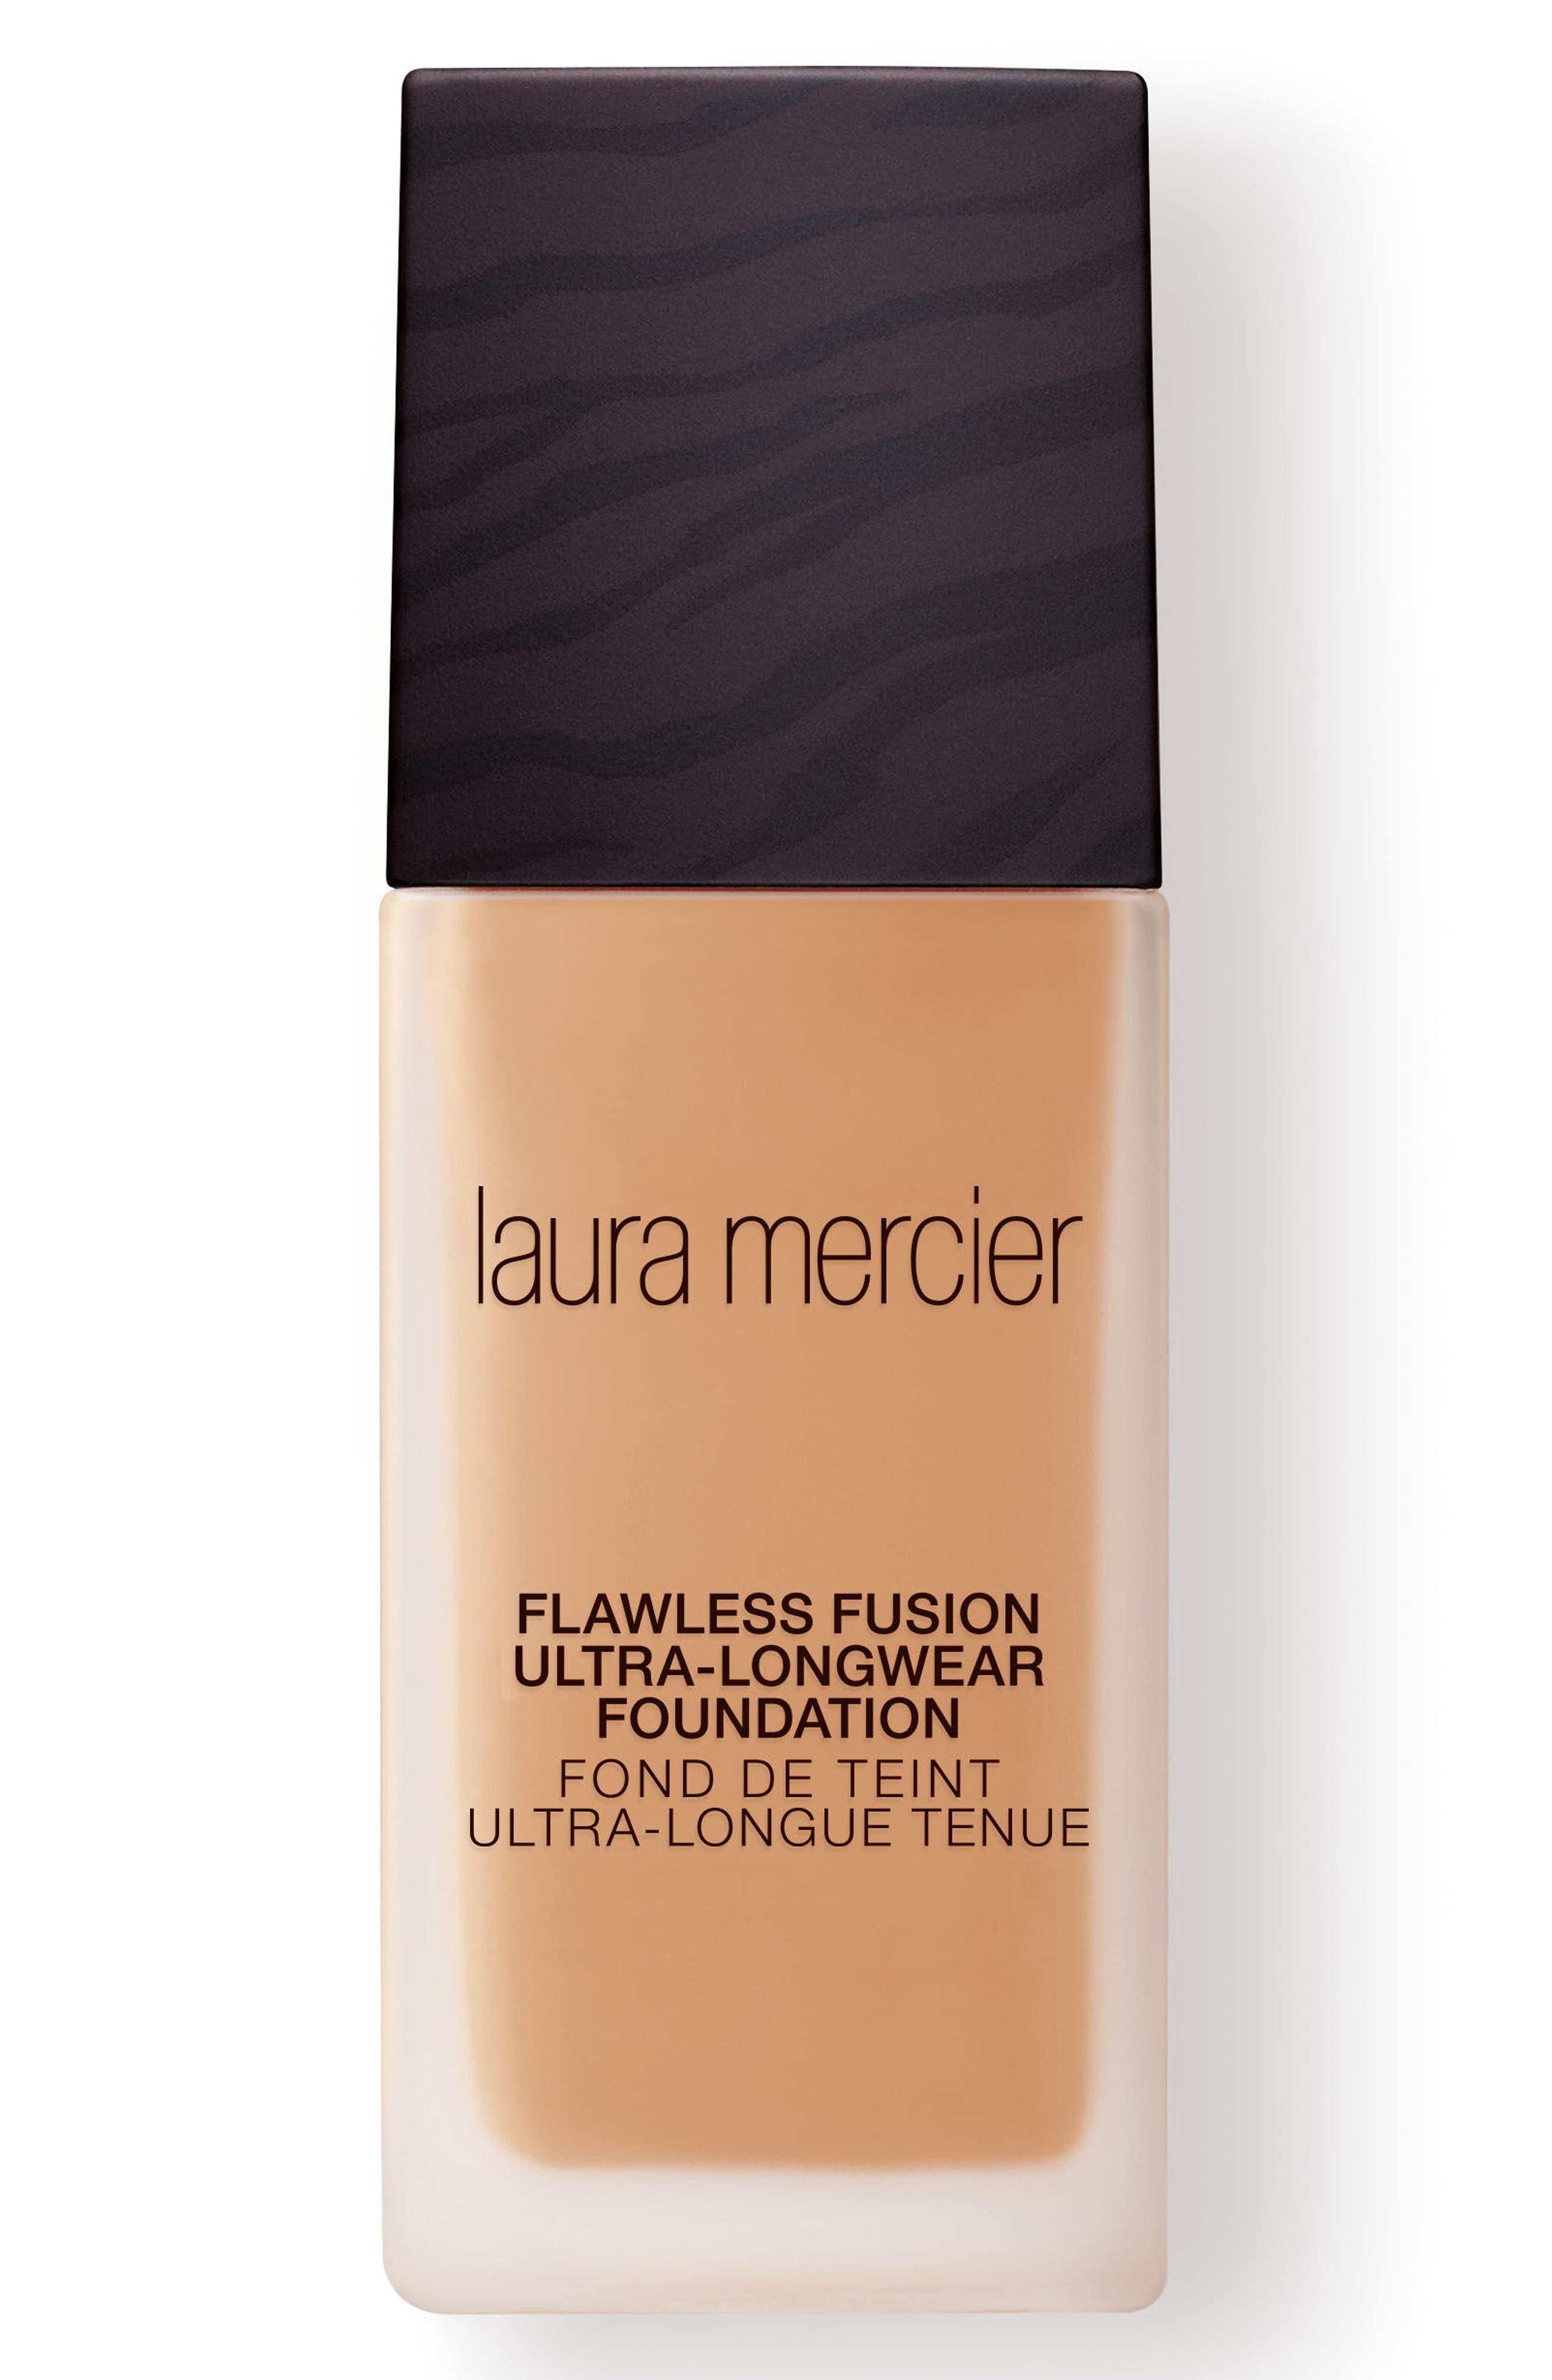 Flawless Fusion Ultra-Longwear Foundation,                             Main thumbnail 1, color,                             2C1 Ecru